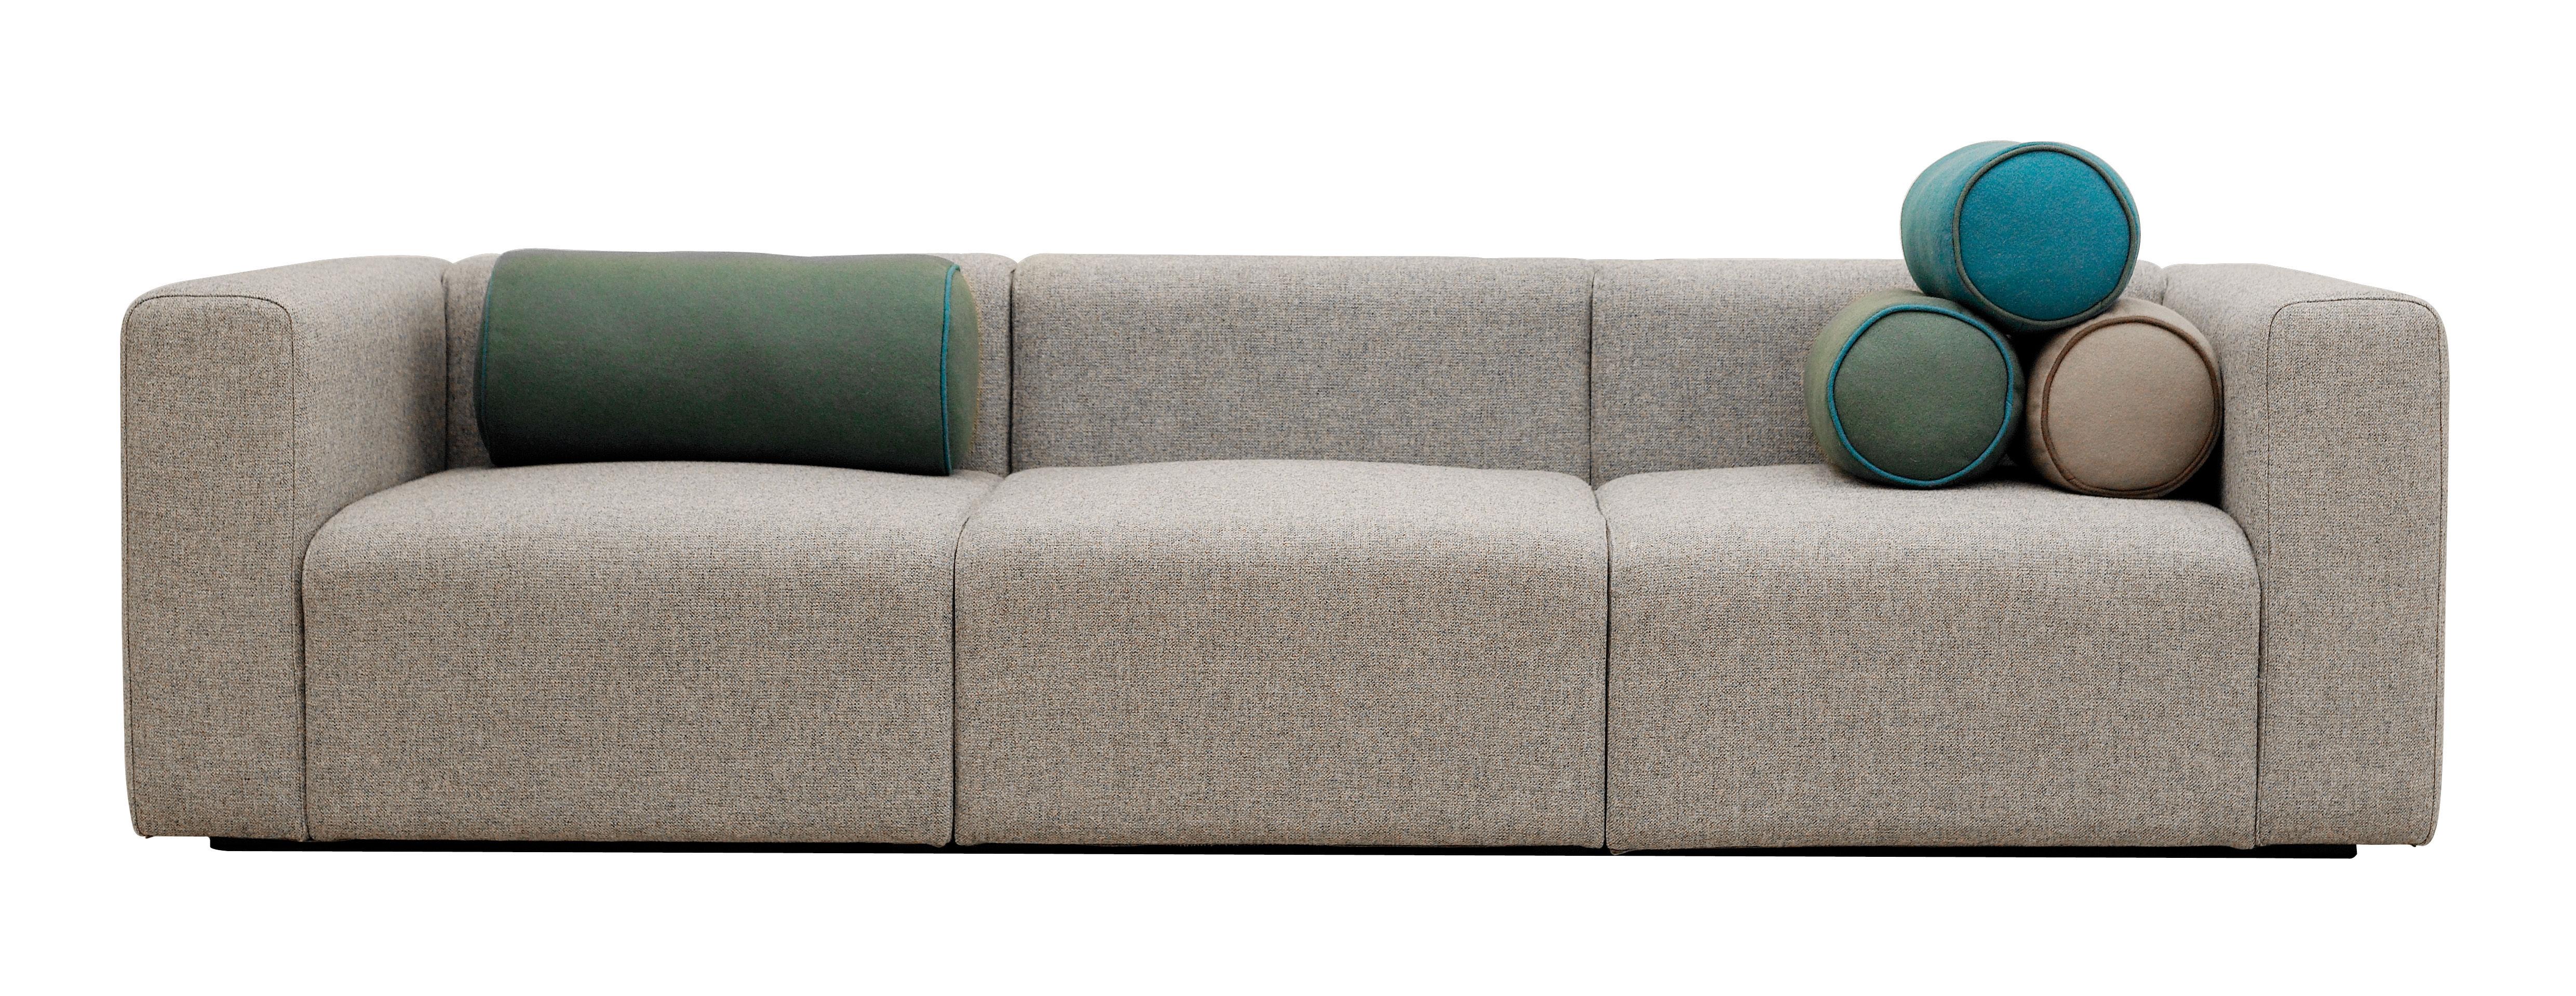 canap droit mags 3 places l 266 cm tissu steelcuttrio beige hay. Black Bedroom Furniture Sets. Home Design Ideas